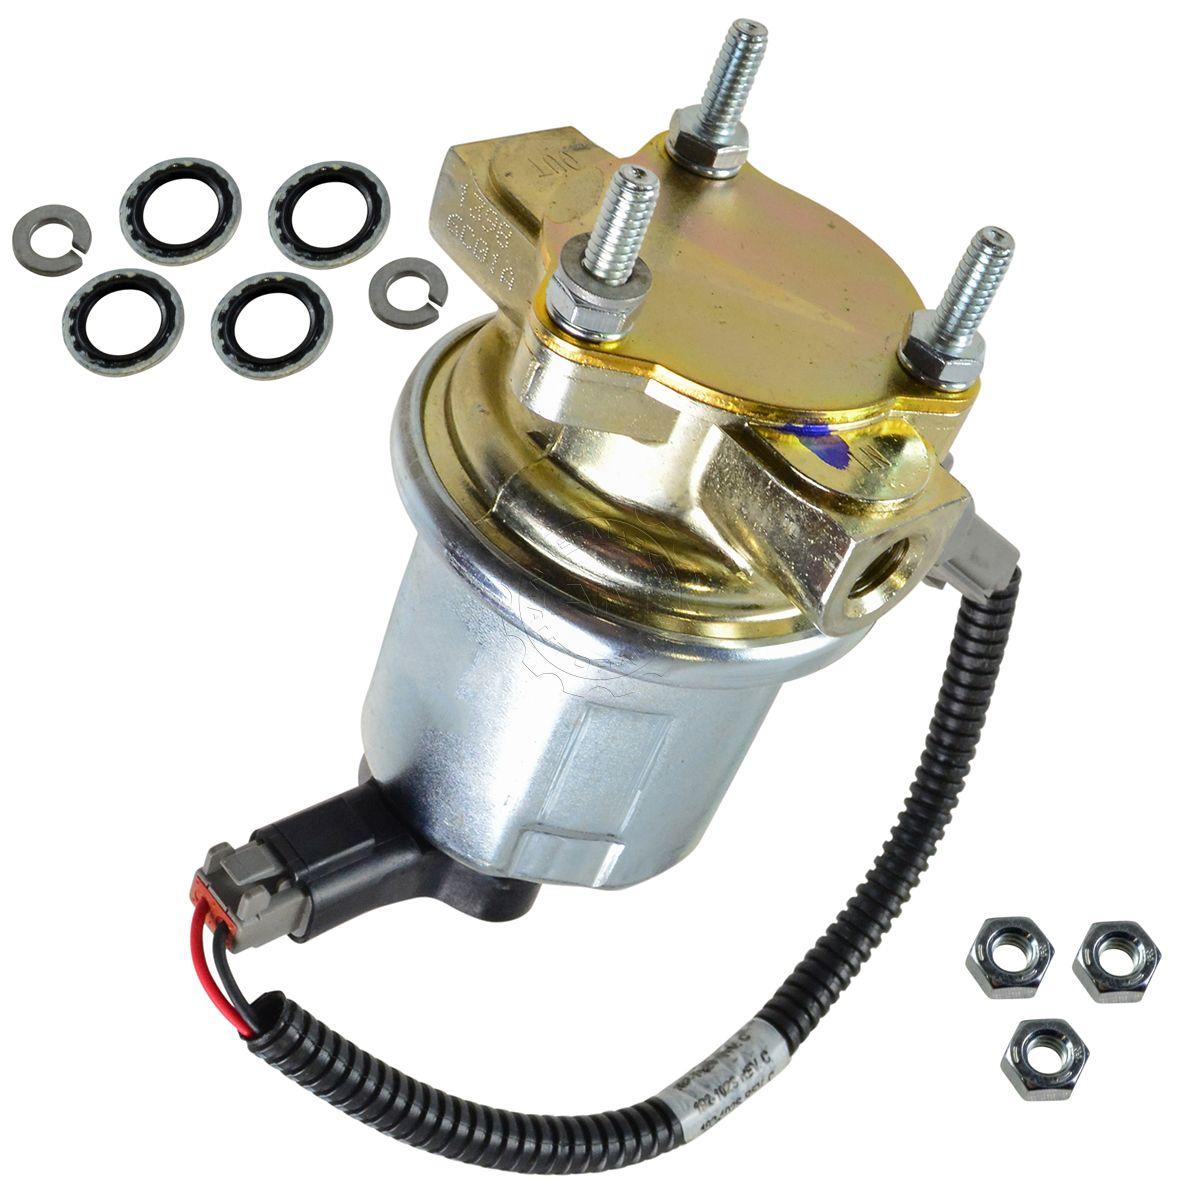 Delphi HFP923 Fuel Lift Pump for Dodge Ram 2500 3500 Cummins 5.9L Turbo  Diesel